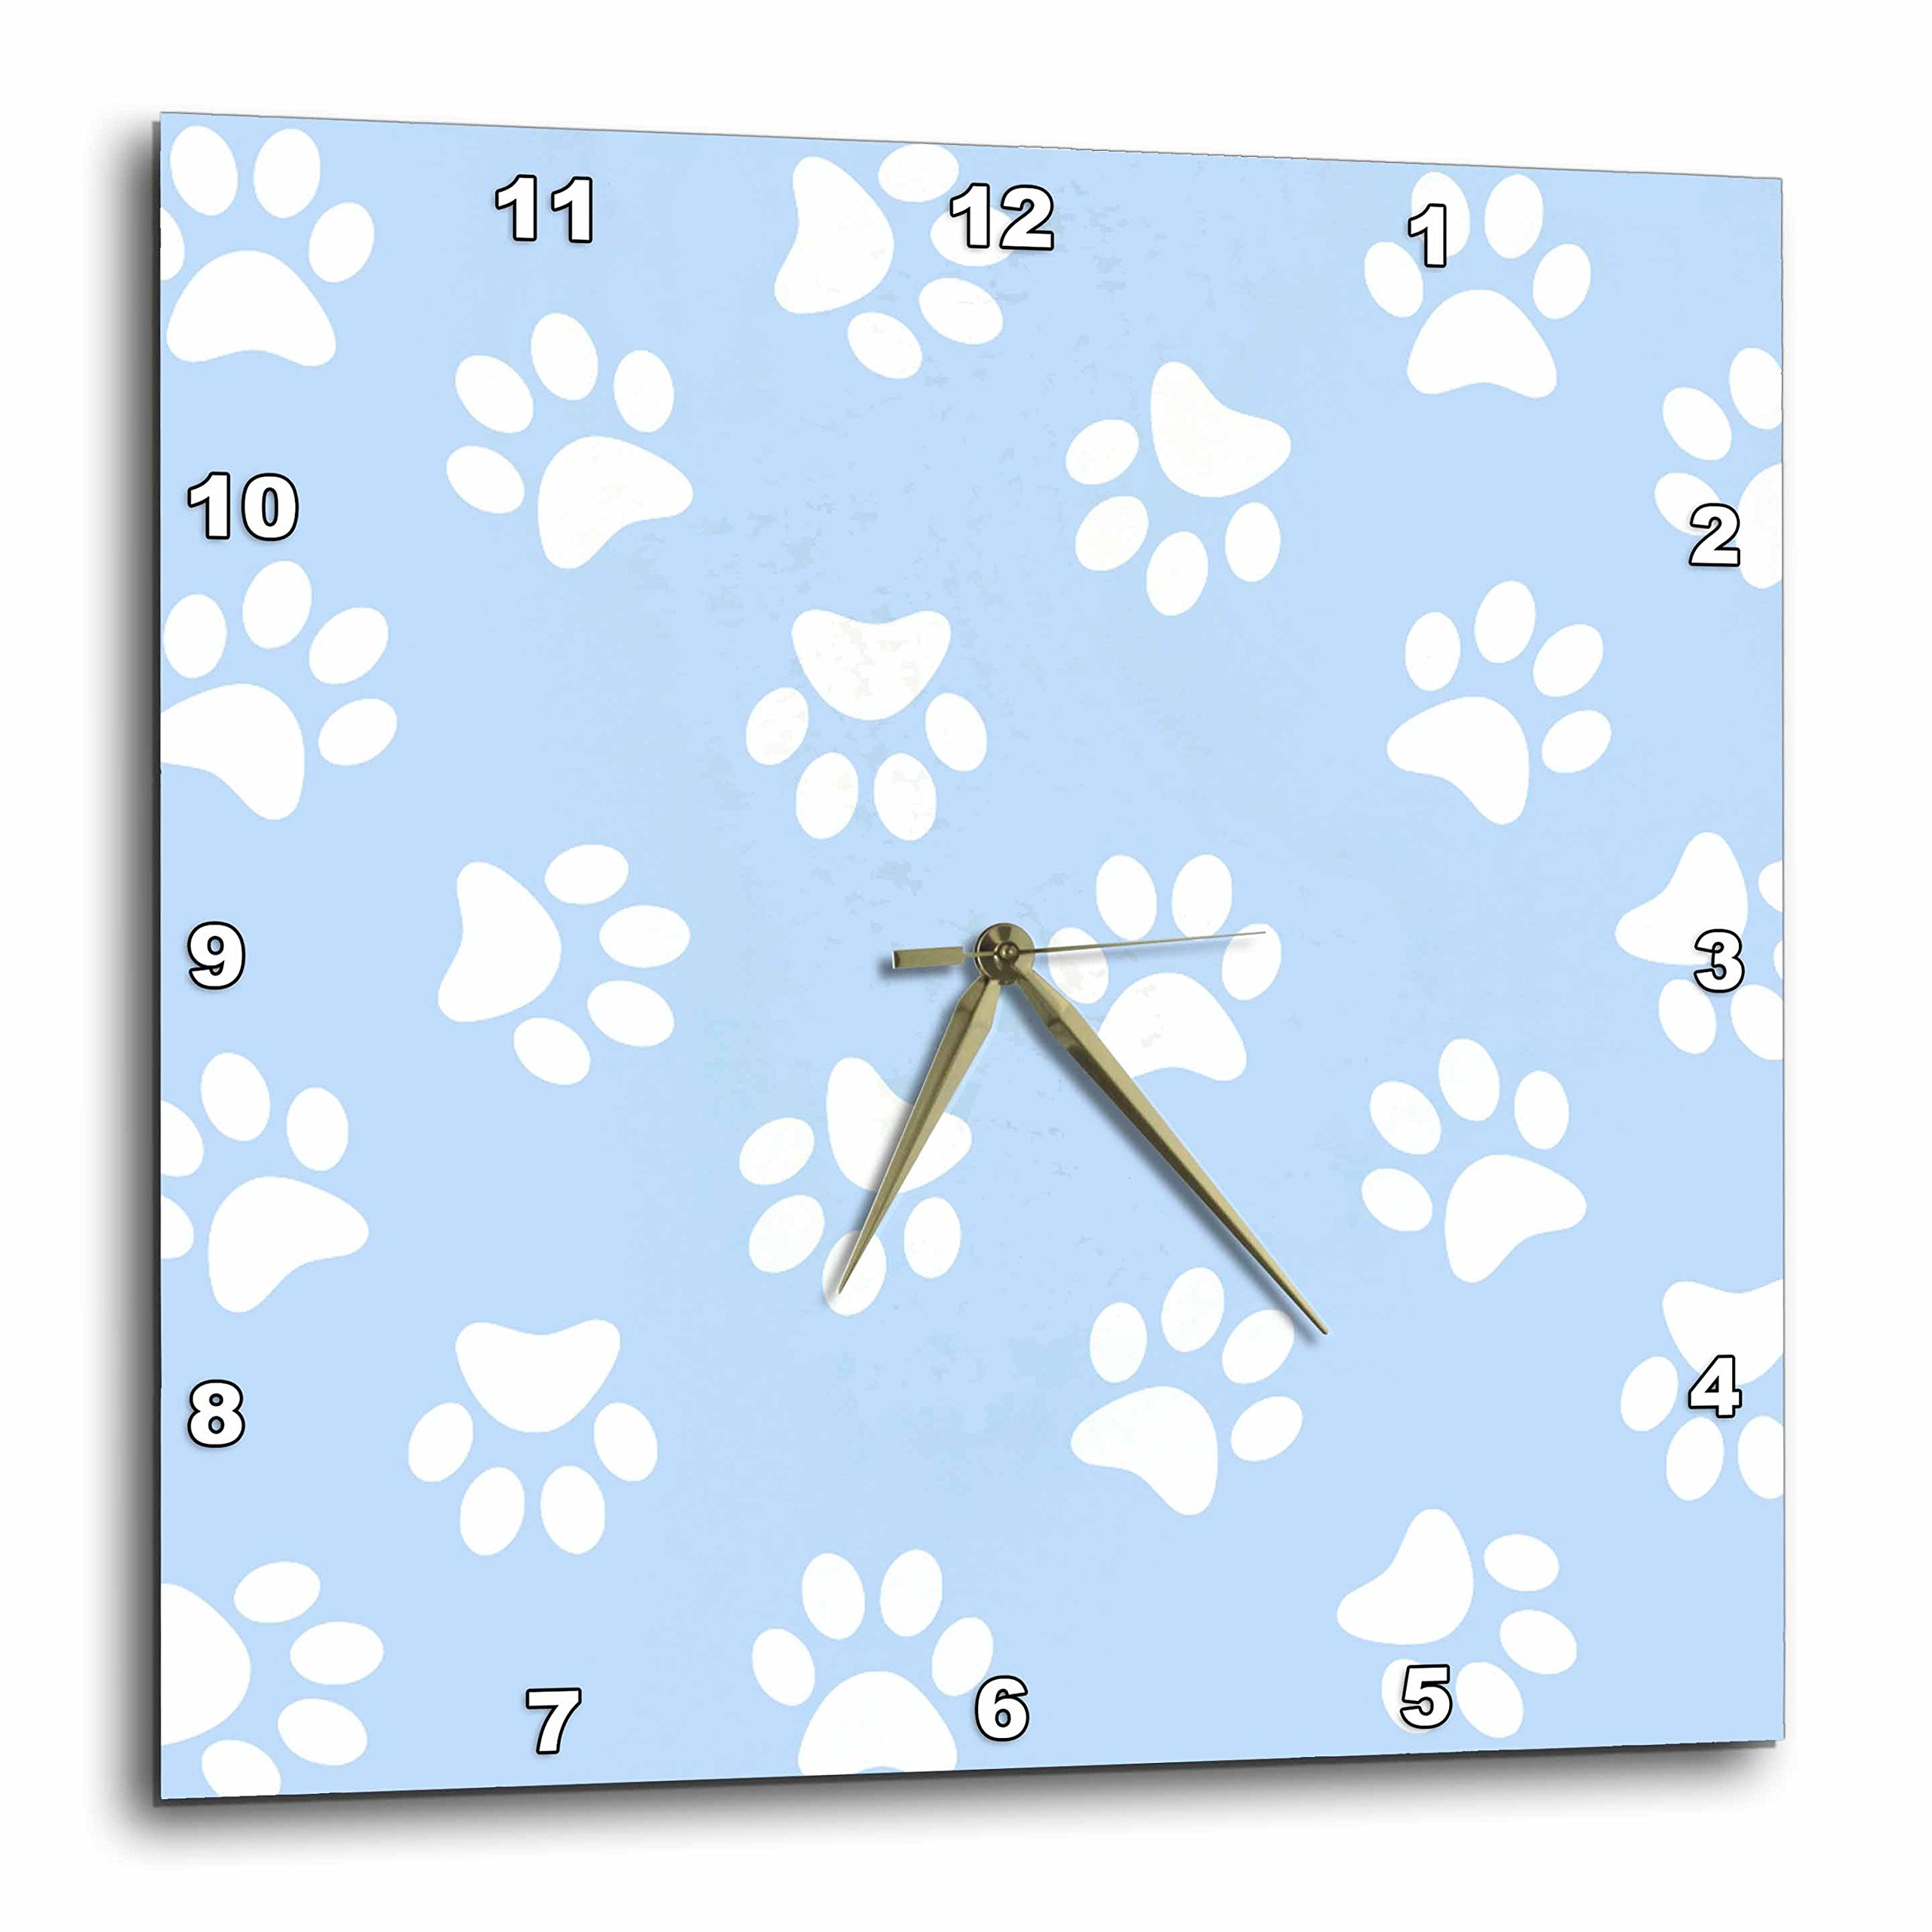 3dRose DPP_161523_1 Blue & White Paw Print Pattern Pawprints Cute Cartoon Animal Eg Dog or Cat Footprints Wall Clock, 10 by 10'' by 3dRose